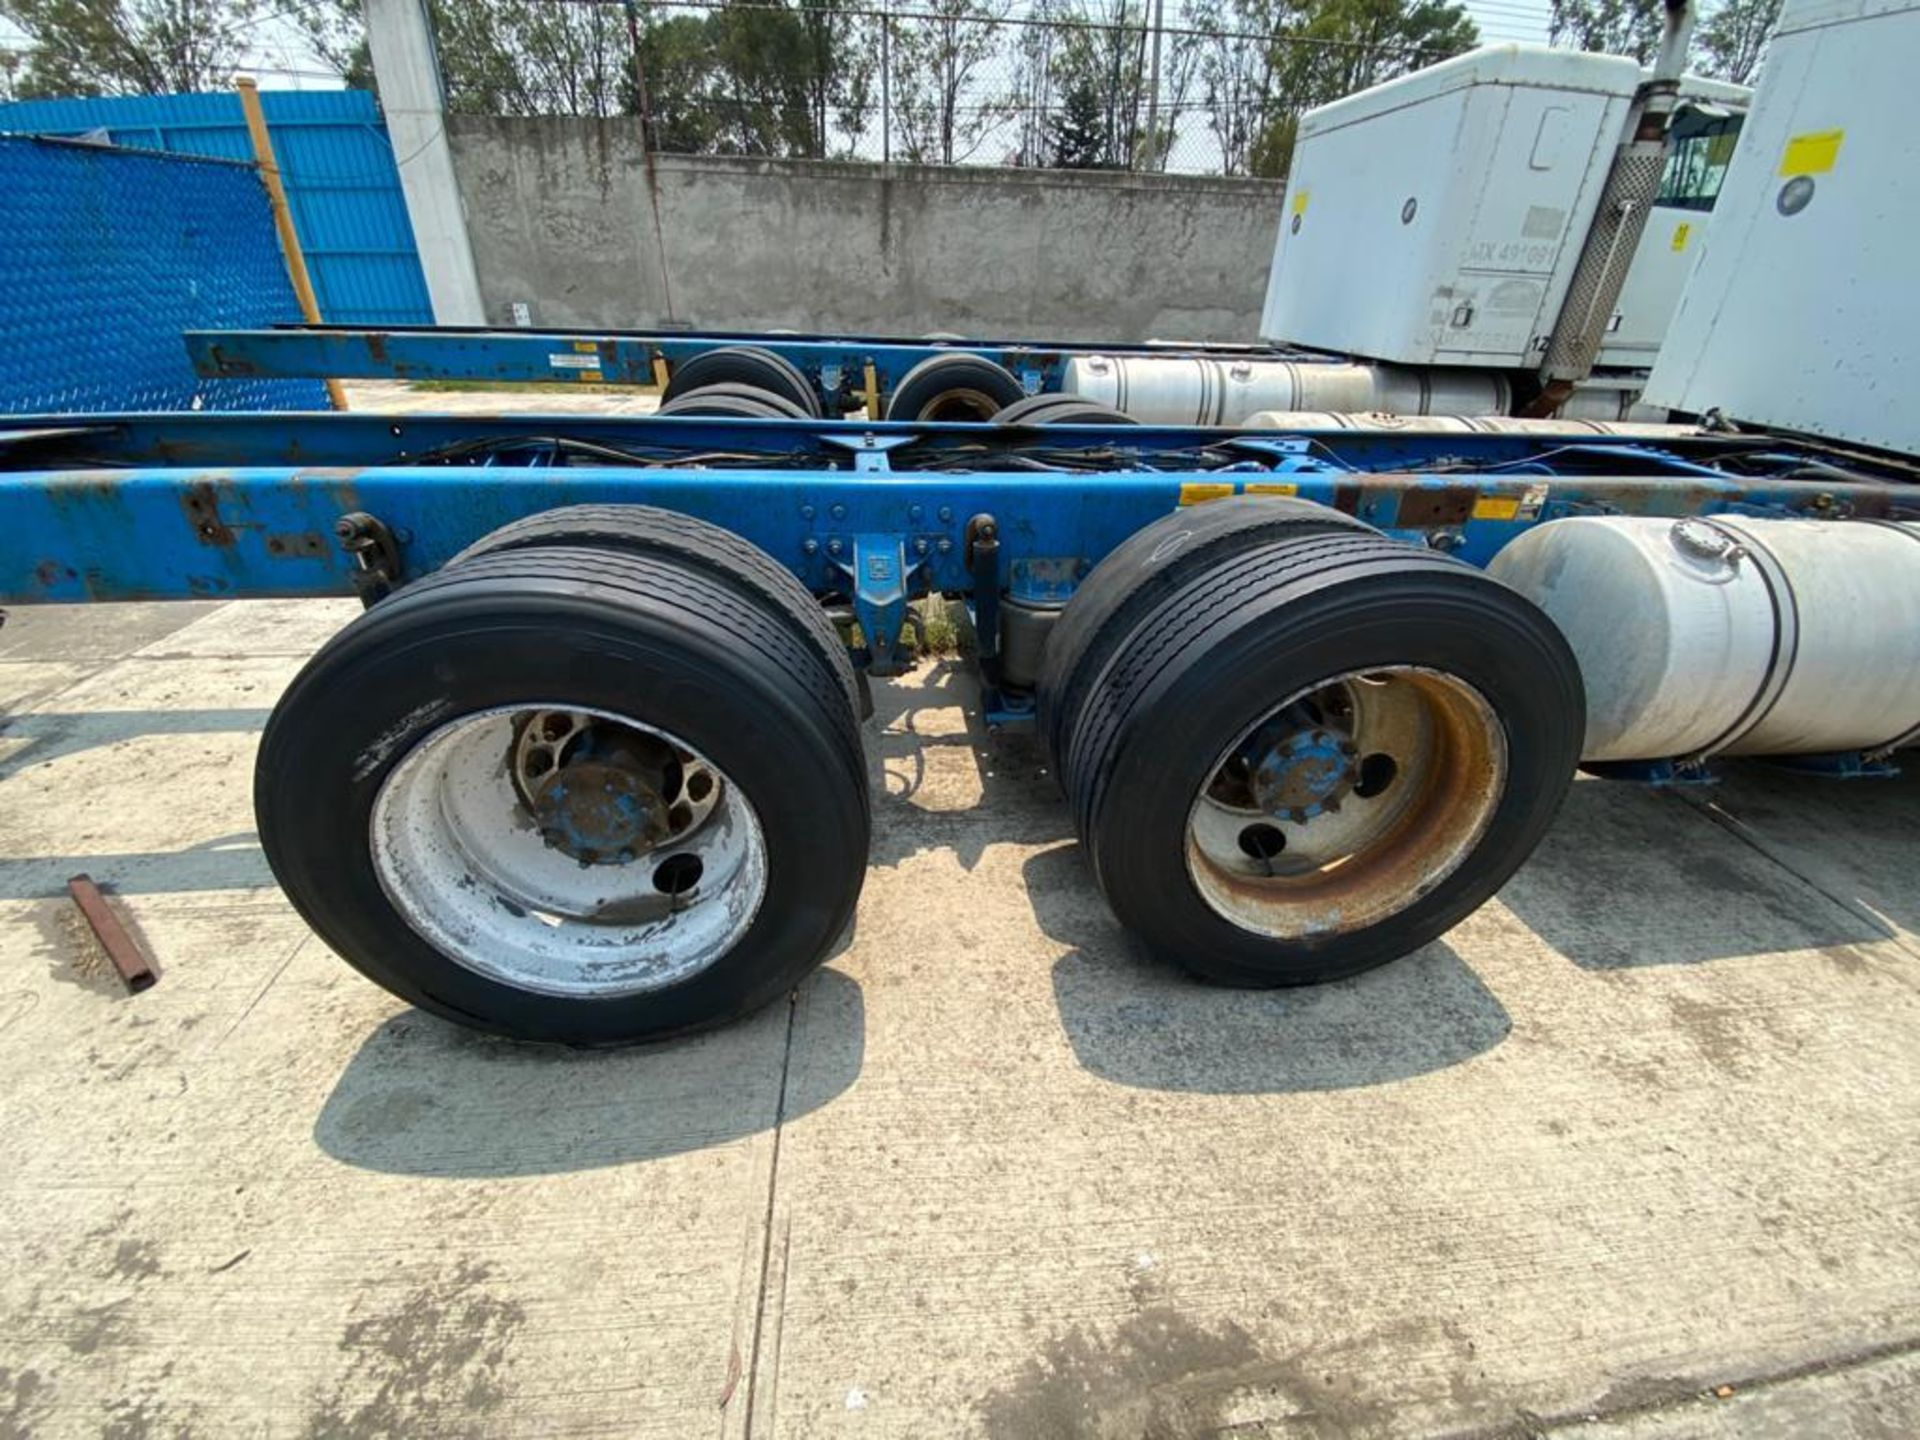 1999 Kenworth Sleeper truck tractor, standard transmission of 18 speeds - Image 23 of 70